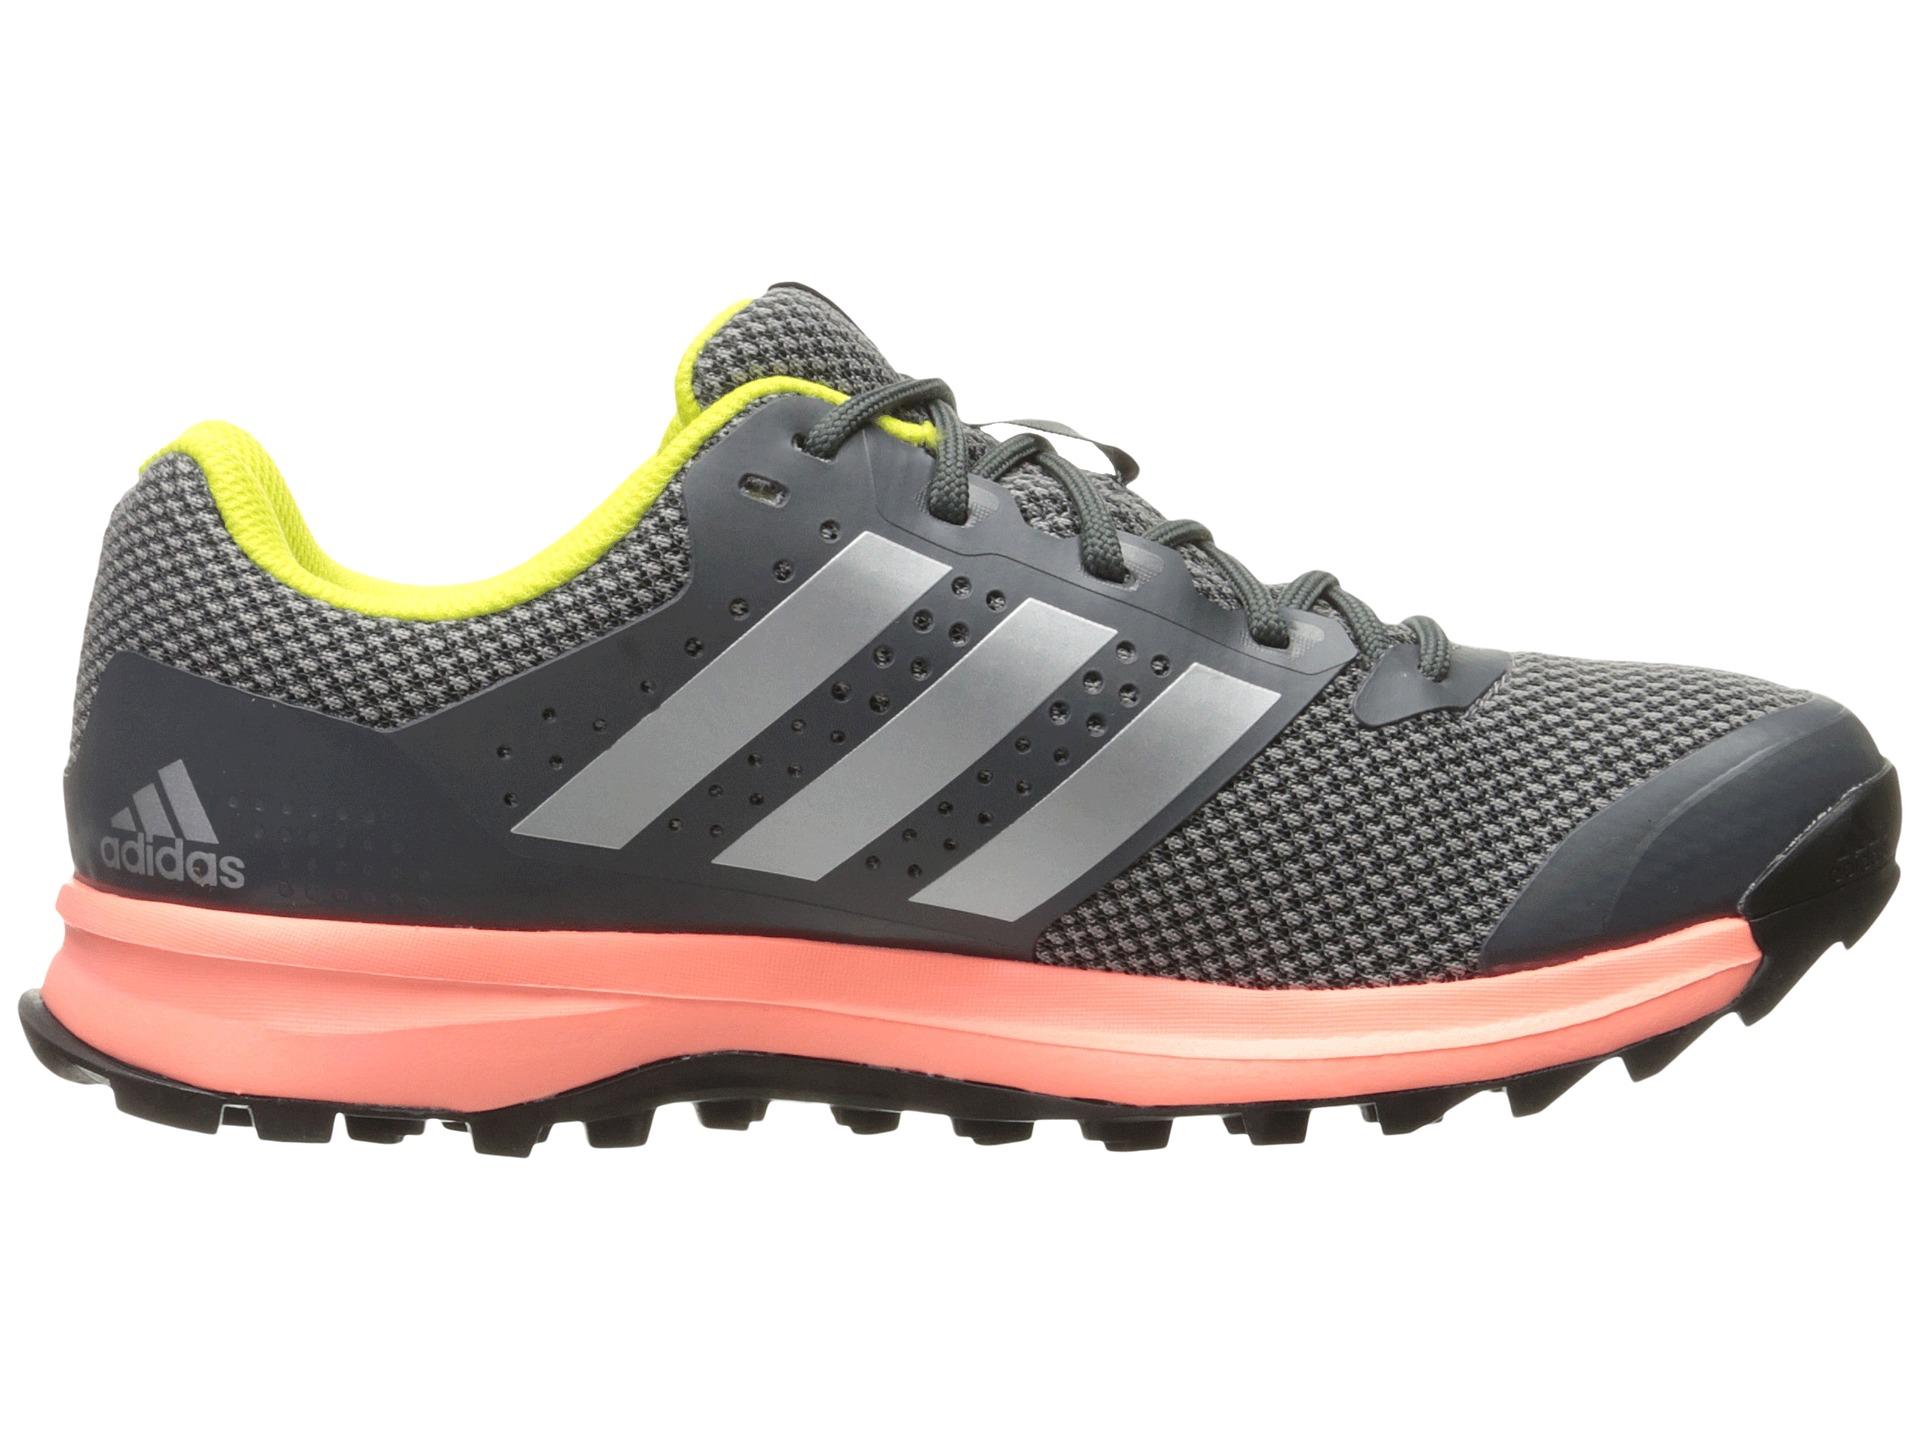 ¡Adidas Duramo 7 Trail défi j'arr tête, J 'y Gagne!